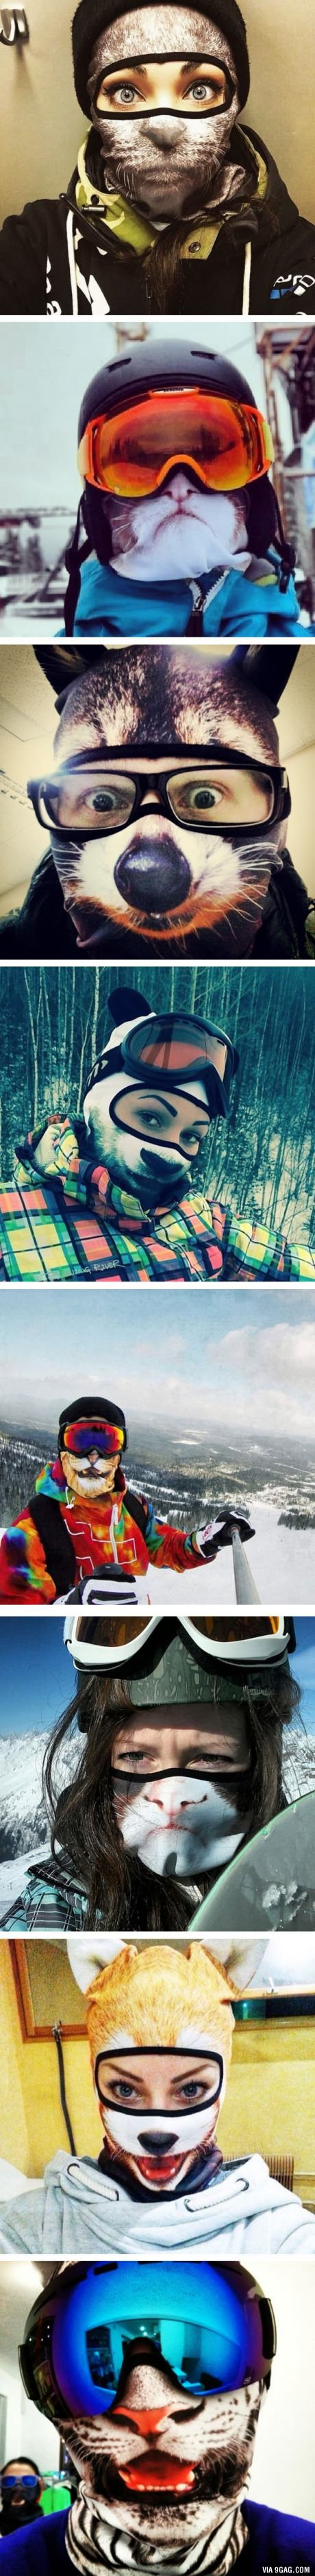 Animal Ski Masks By Teya Salat